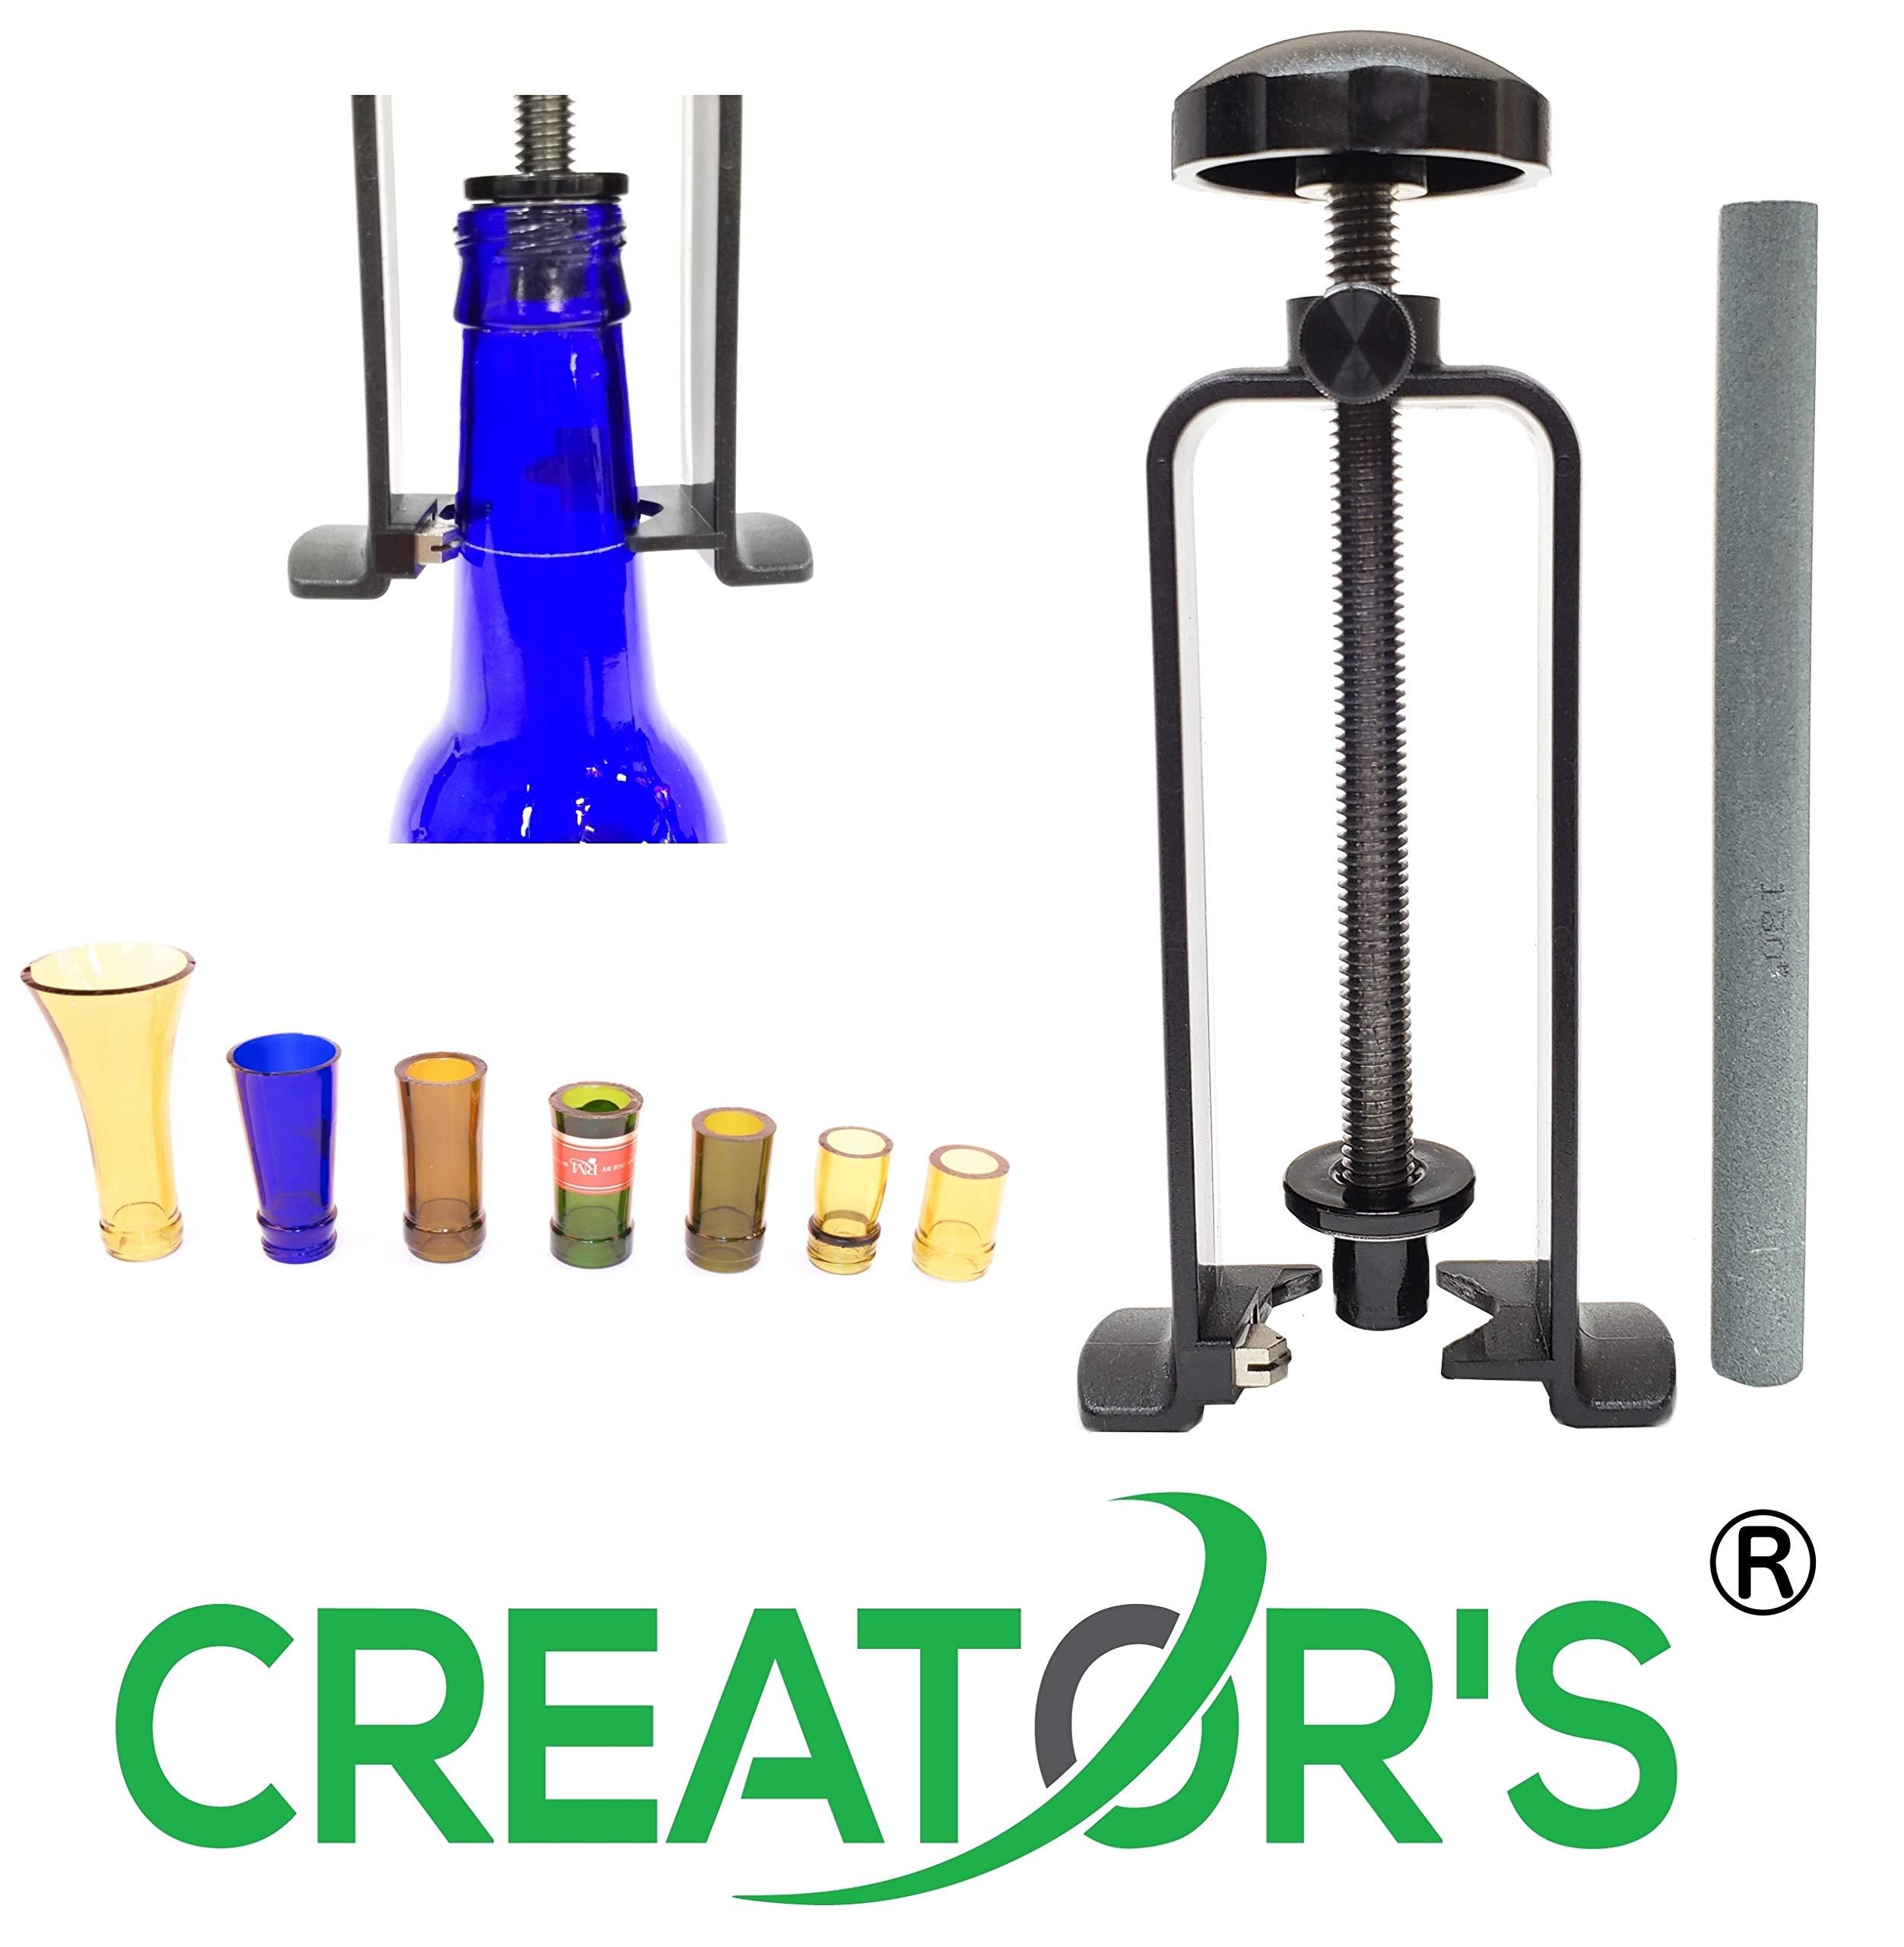 Creator's Glass Bottle Neck Cutter DIY Machine Includes Abrasive Stone CBNC-USA by Creator's